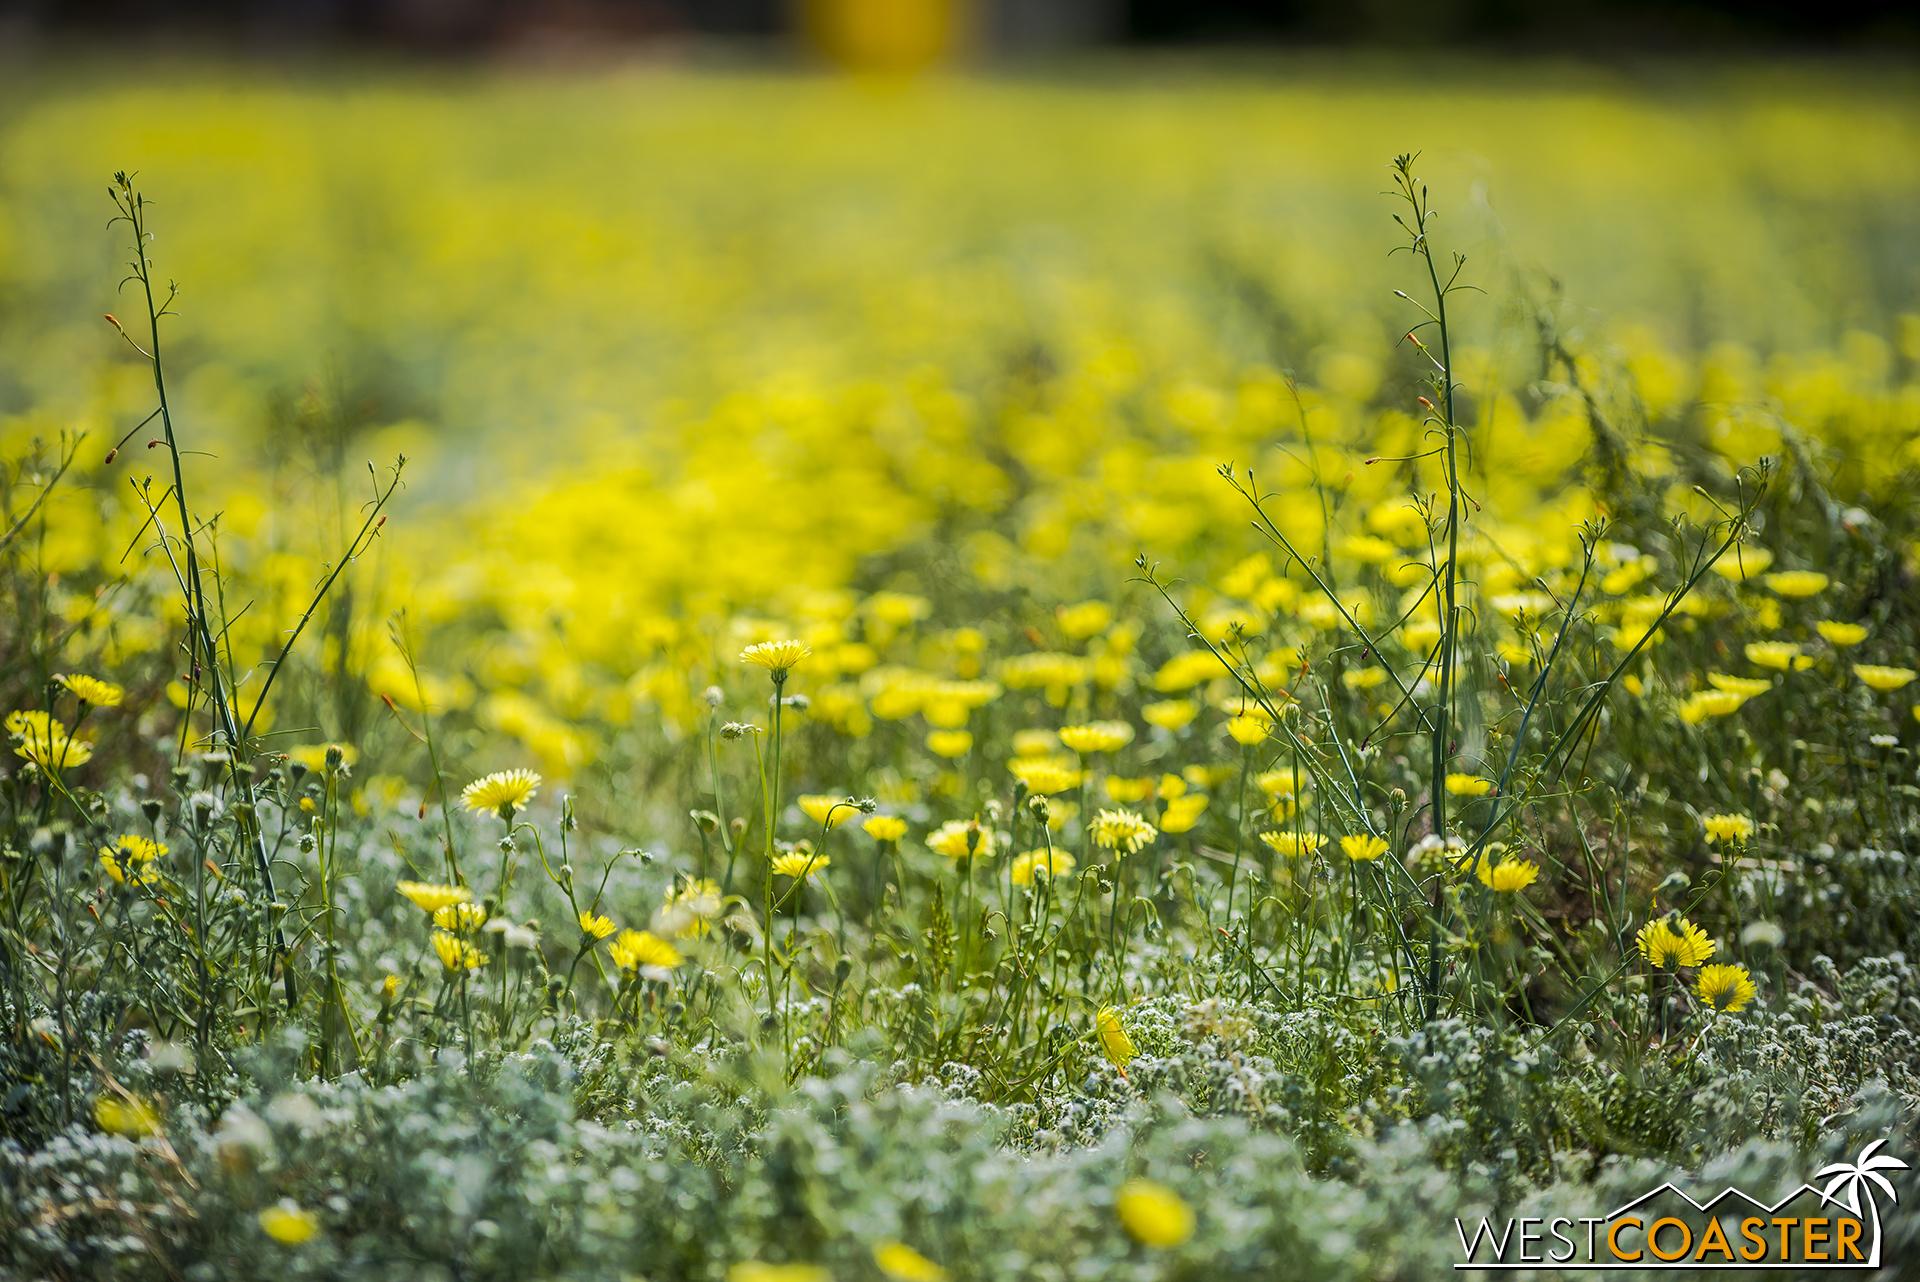 Desert dandelions in shallow depth of field.